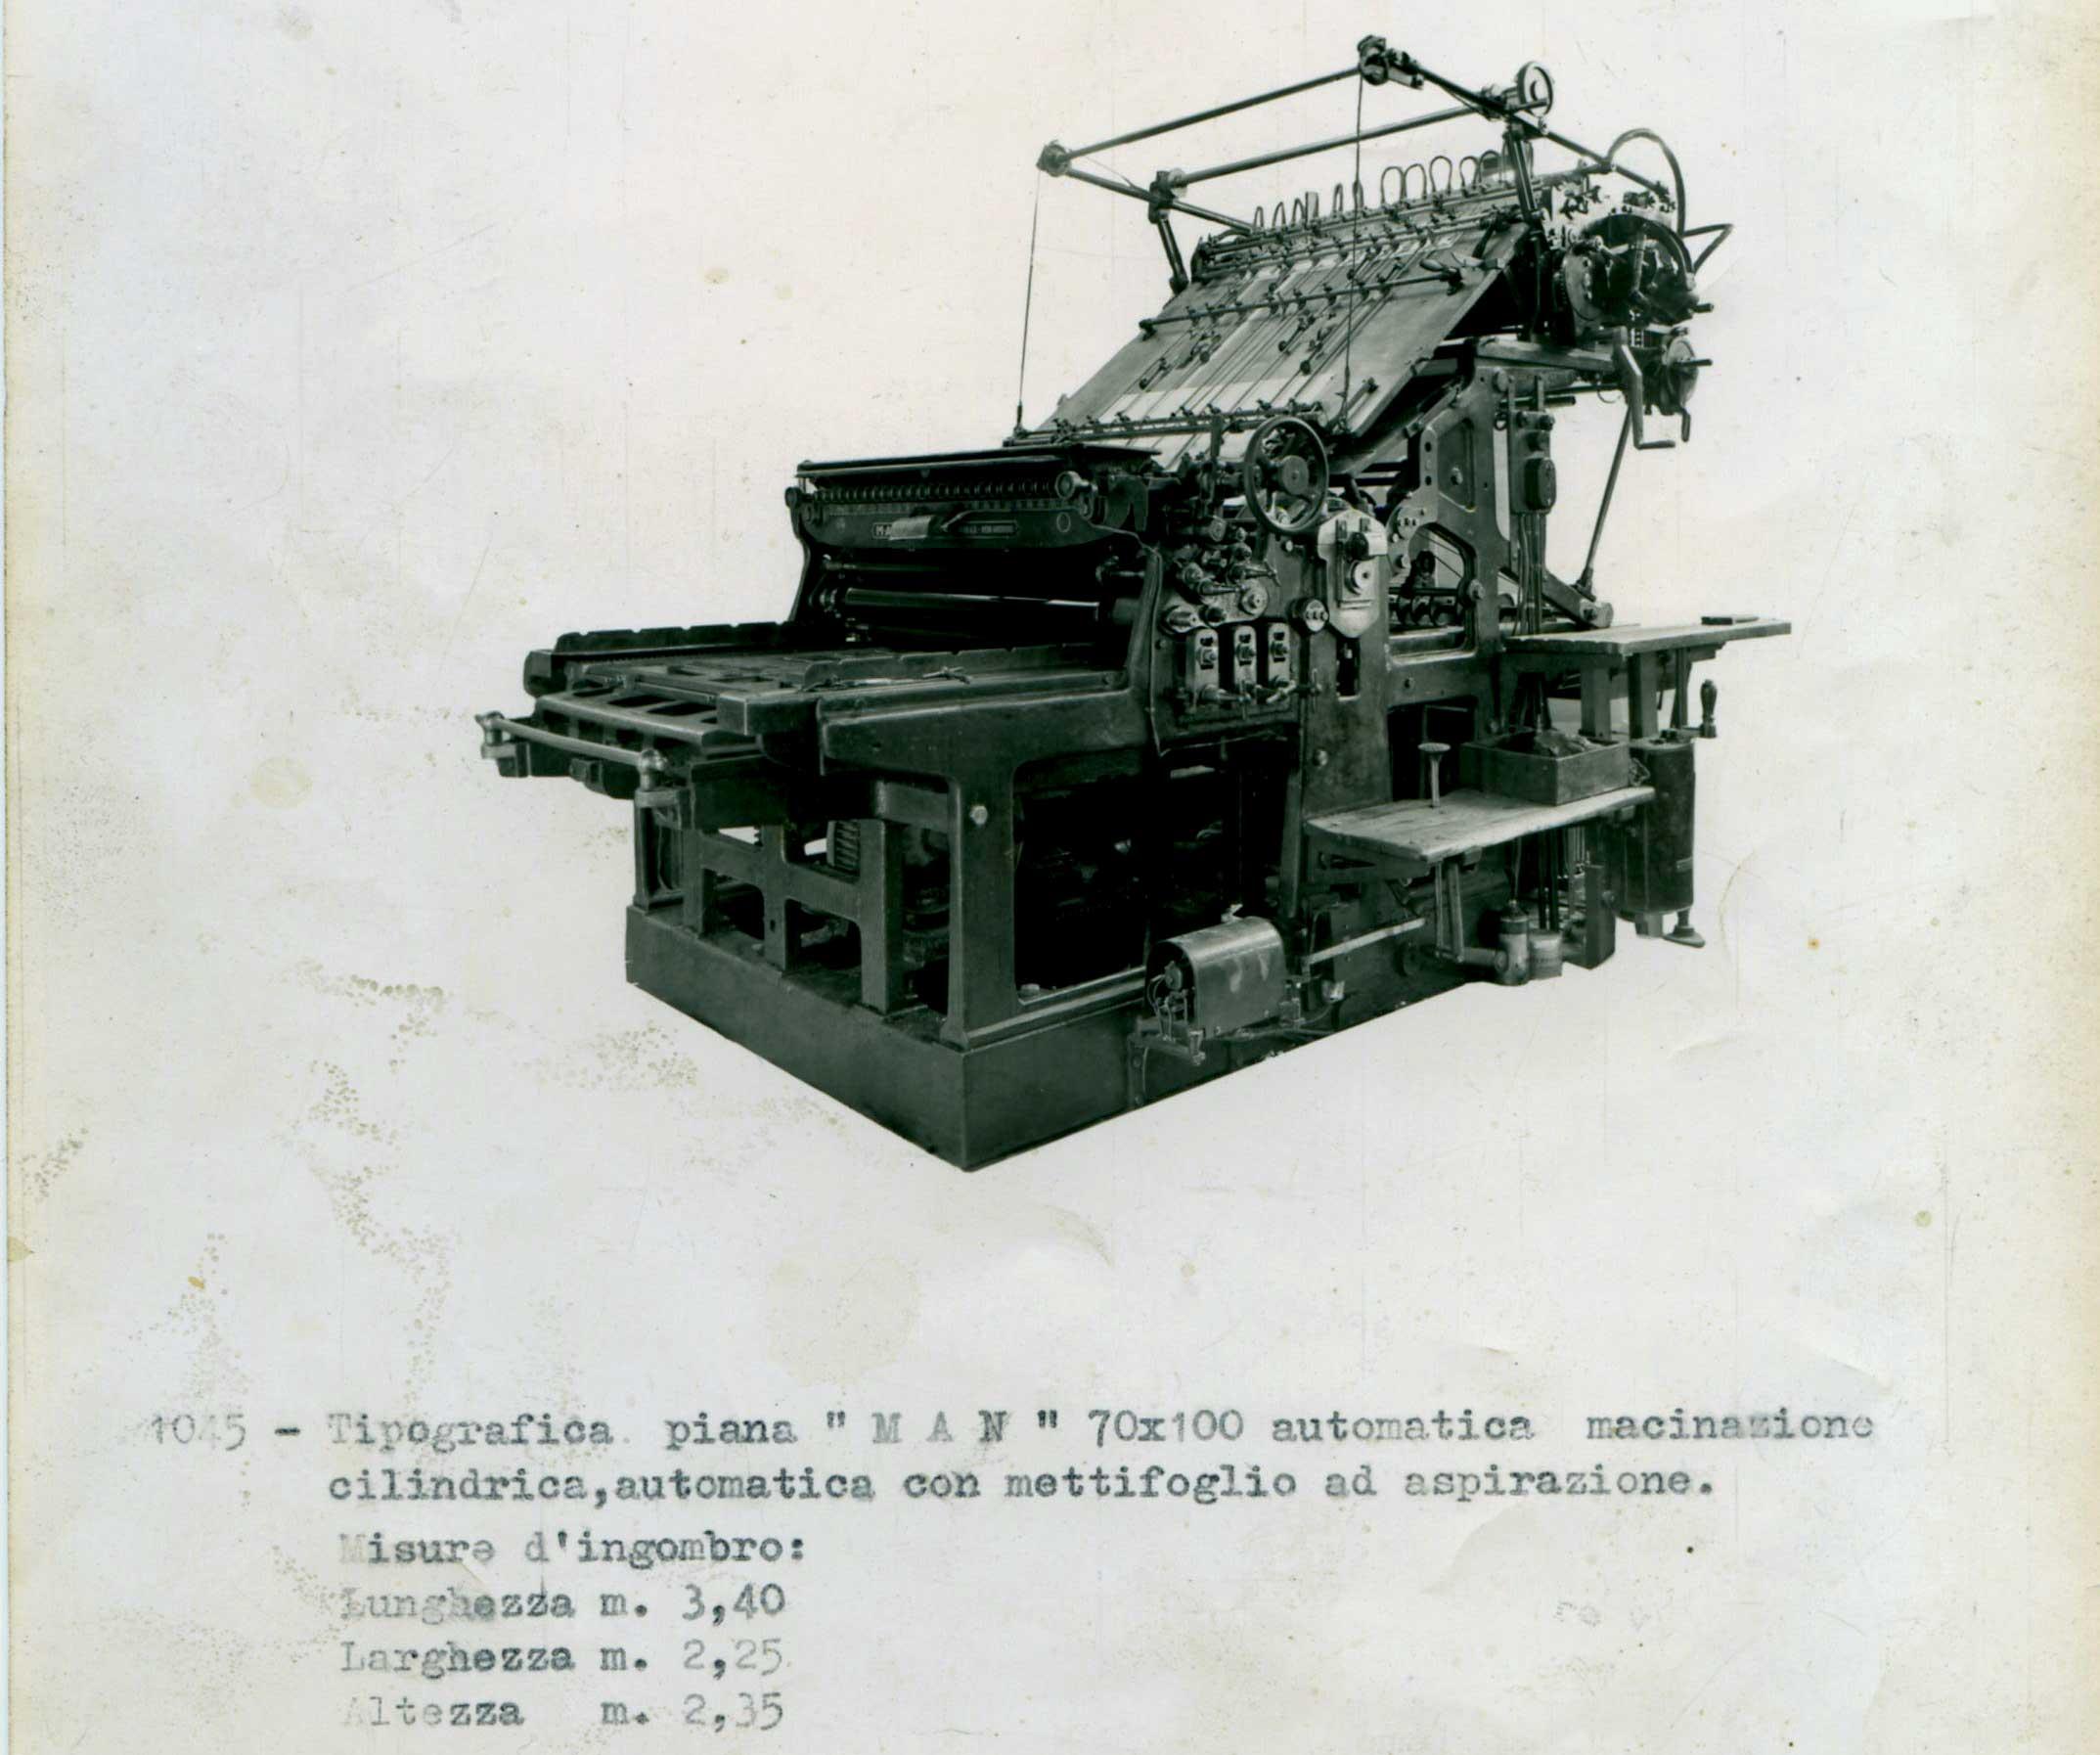 macchina da stampa vecchia - tipografia sady francinetti